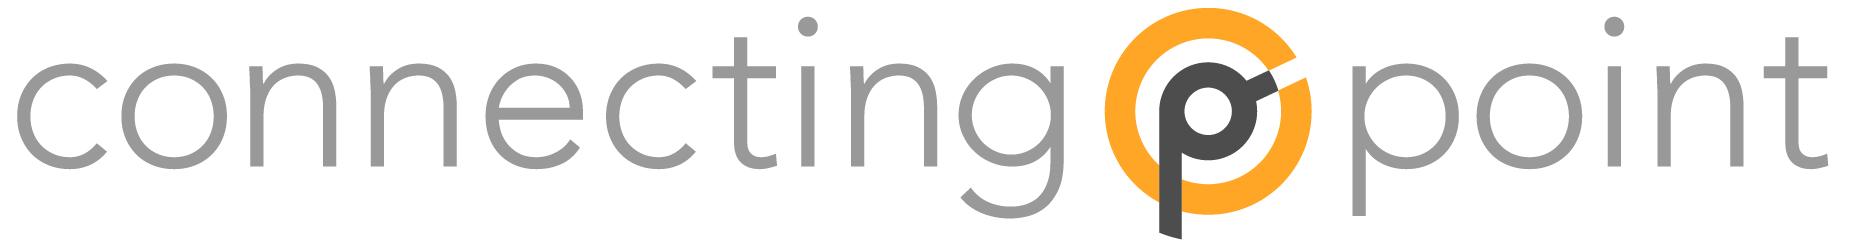 Connecting Point Logo-01.jpg